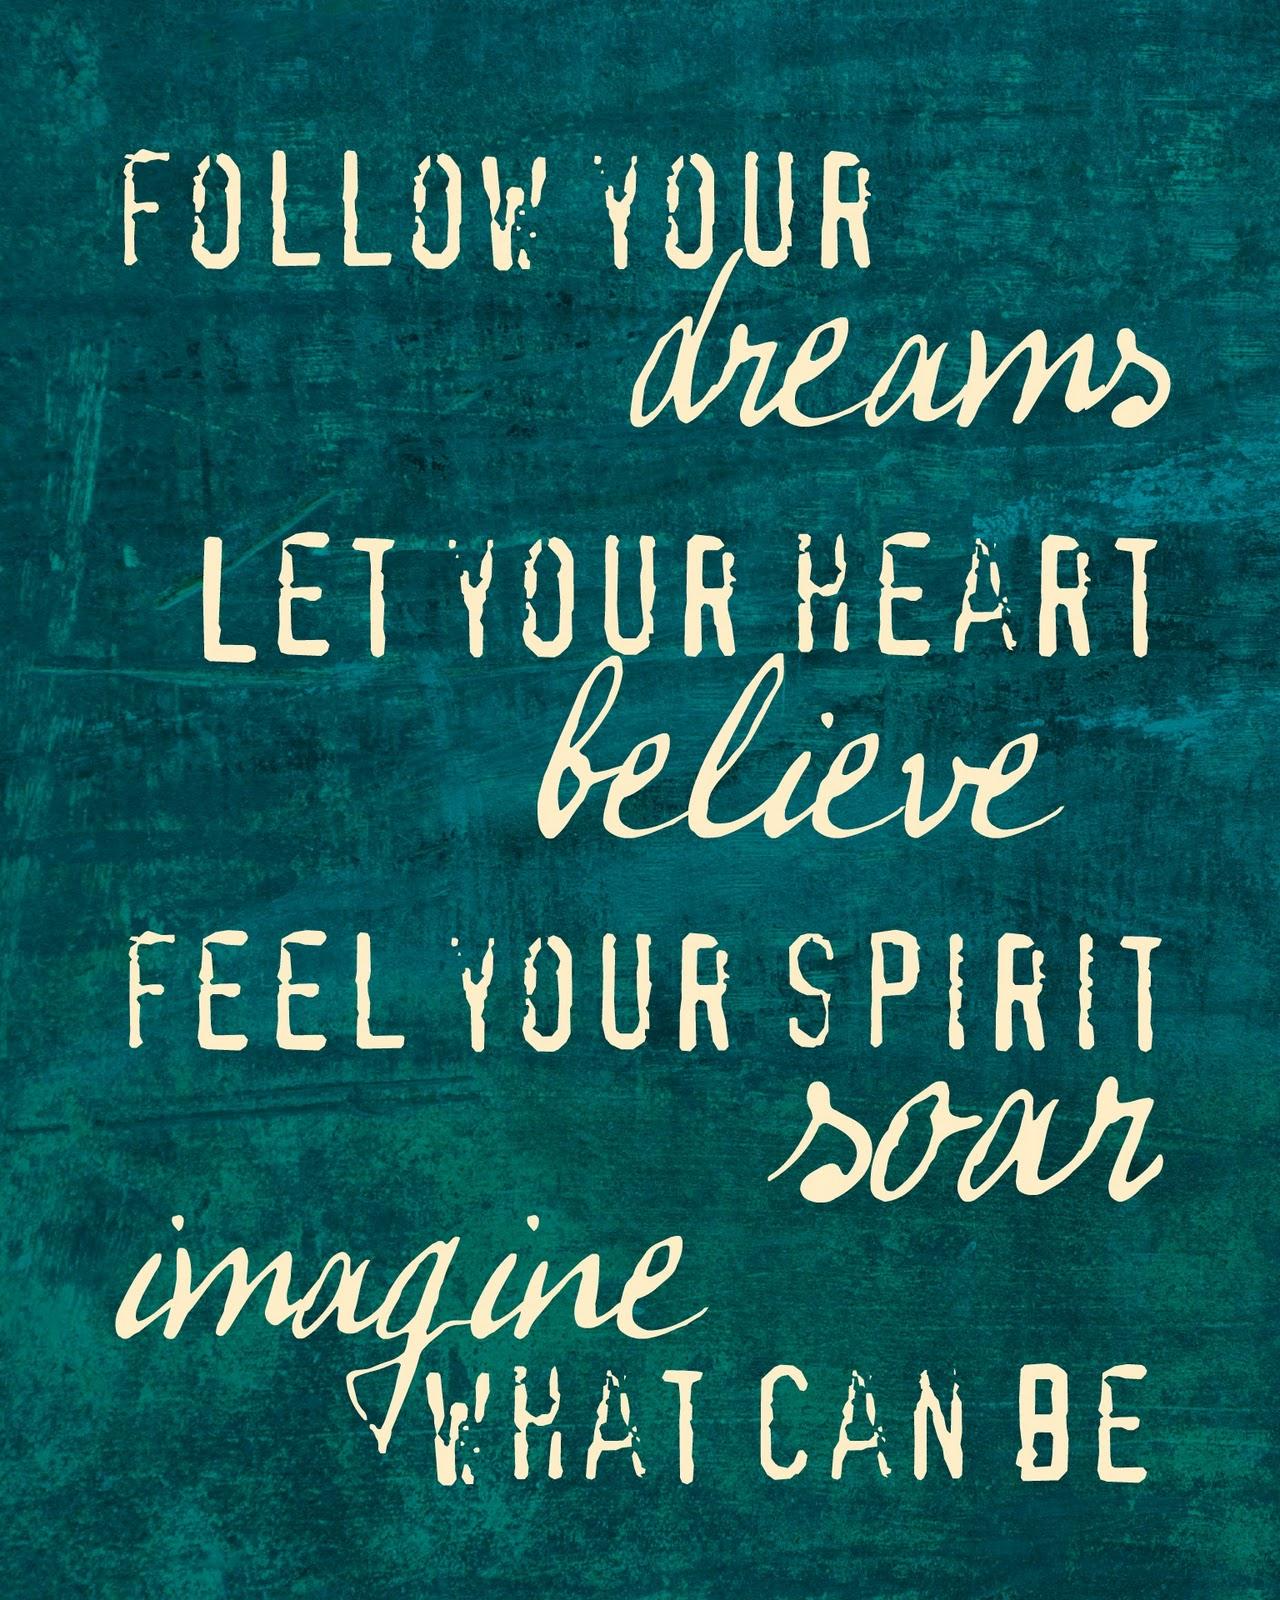 Follow Your Dreams Quotes. QuotesGram